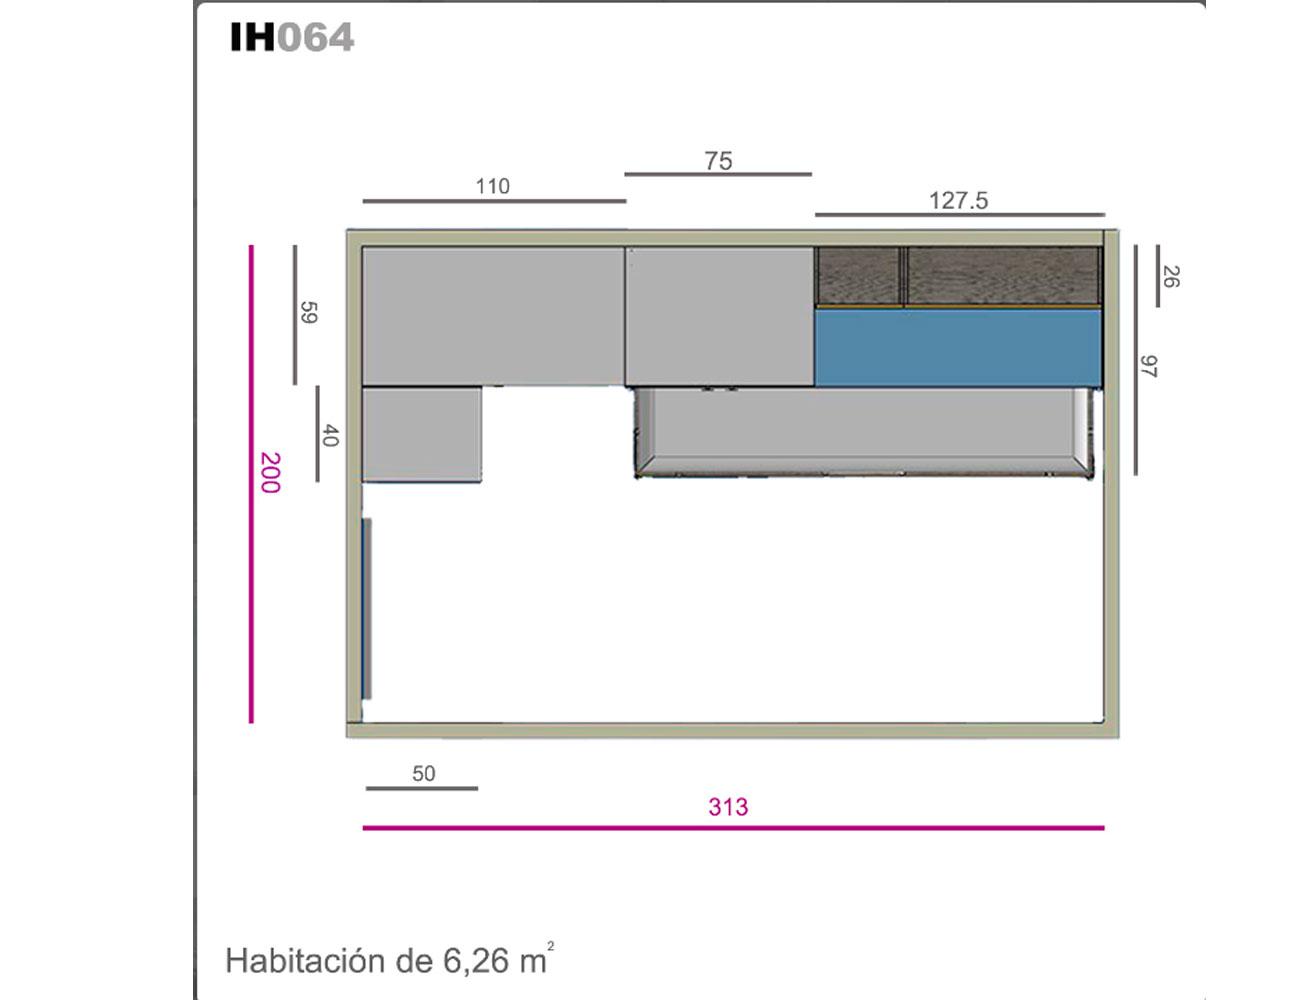 Ih064 medidas